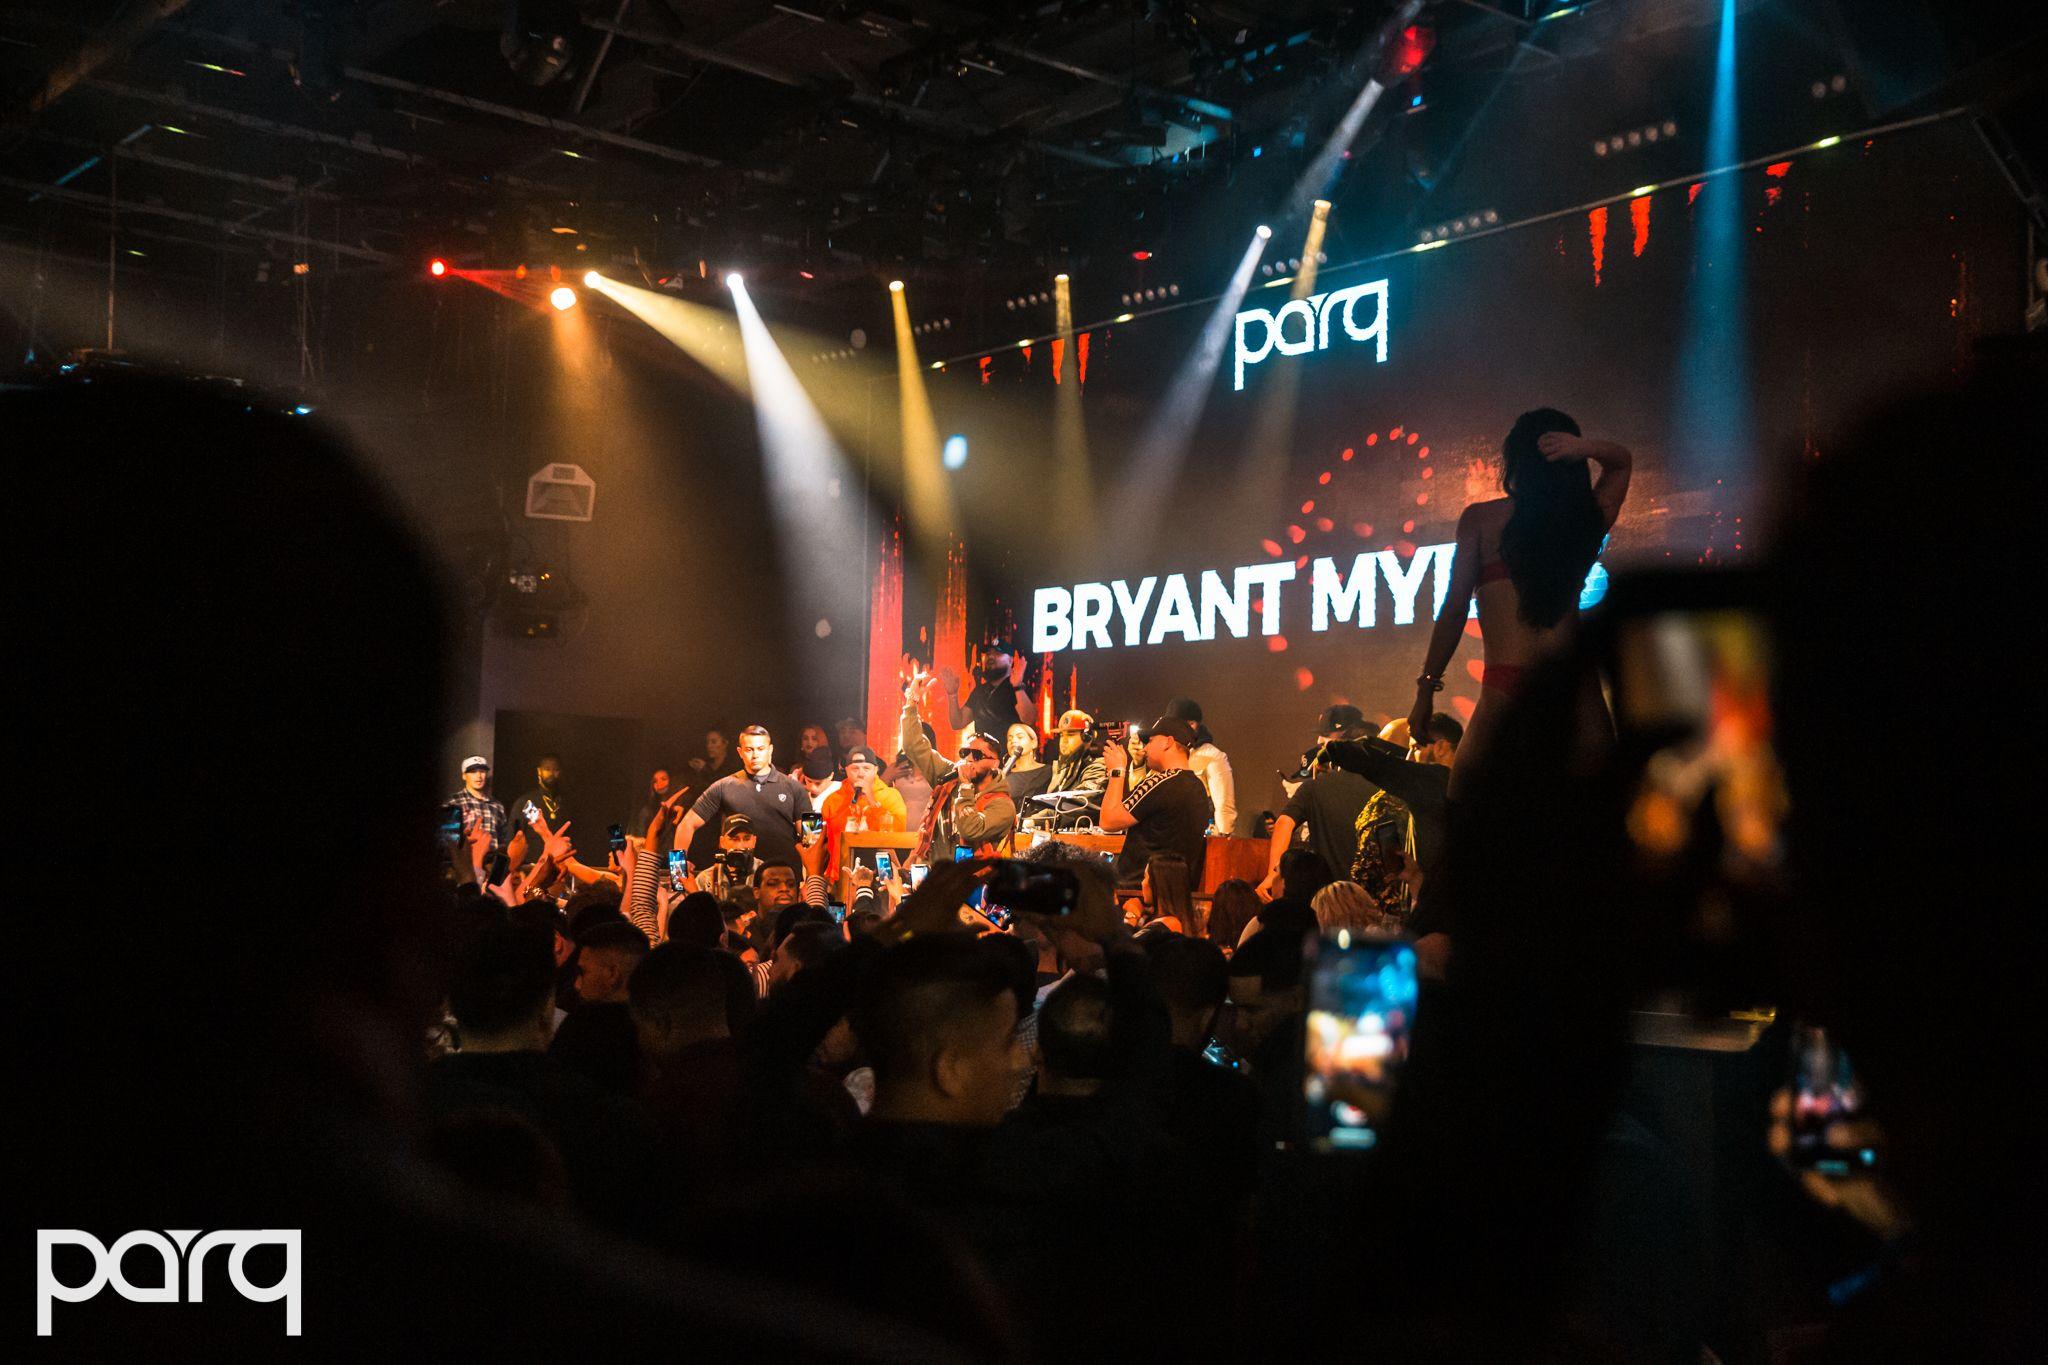 12.13.19 Parq - Bryant Myers-17.jpg